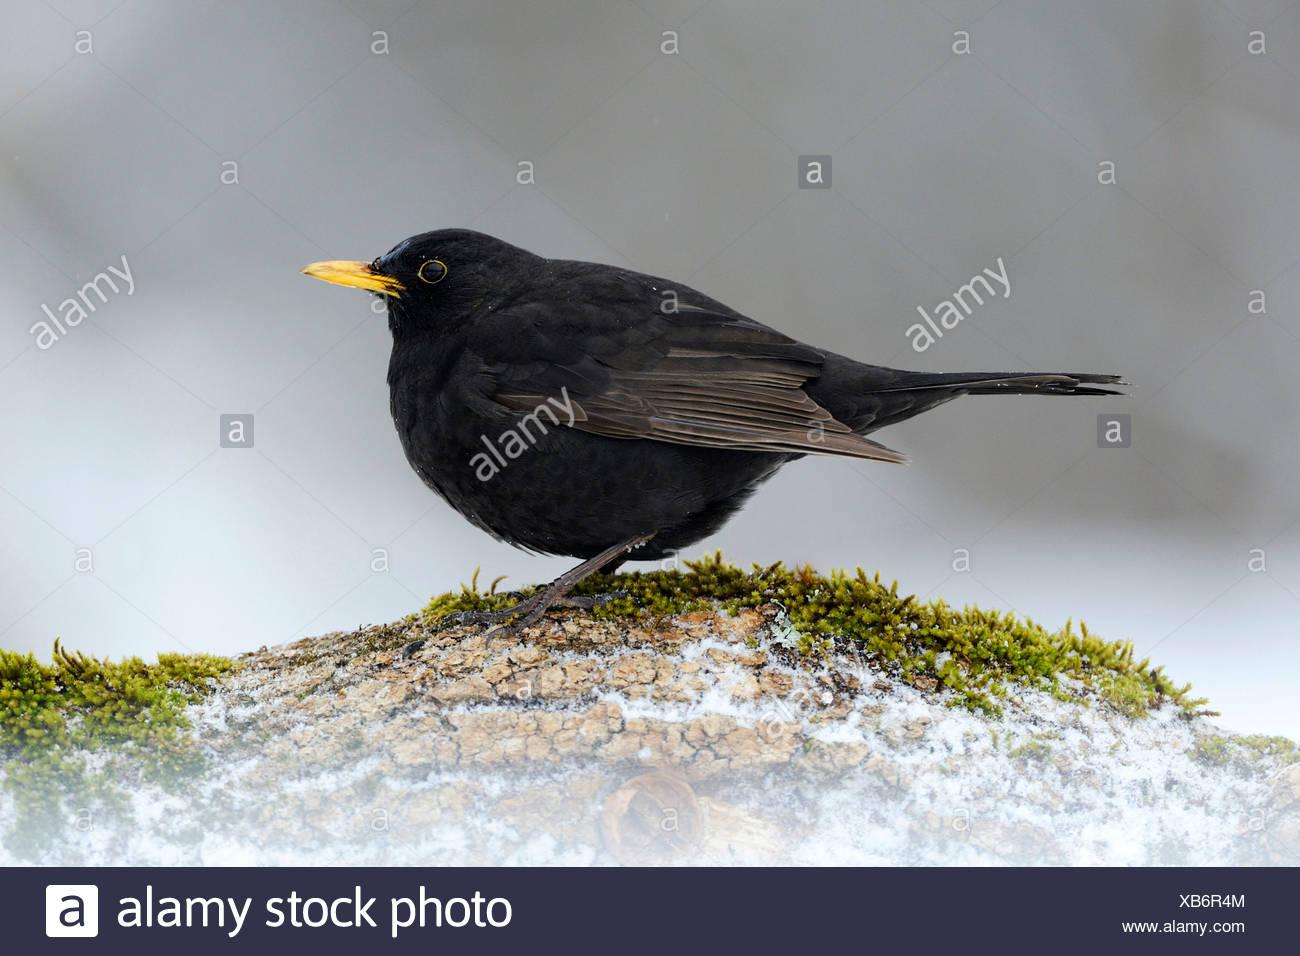 Blackbird (Turdus merula), male, Bulgaria, Europe - Stock Image